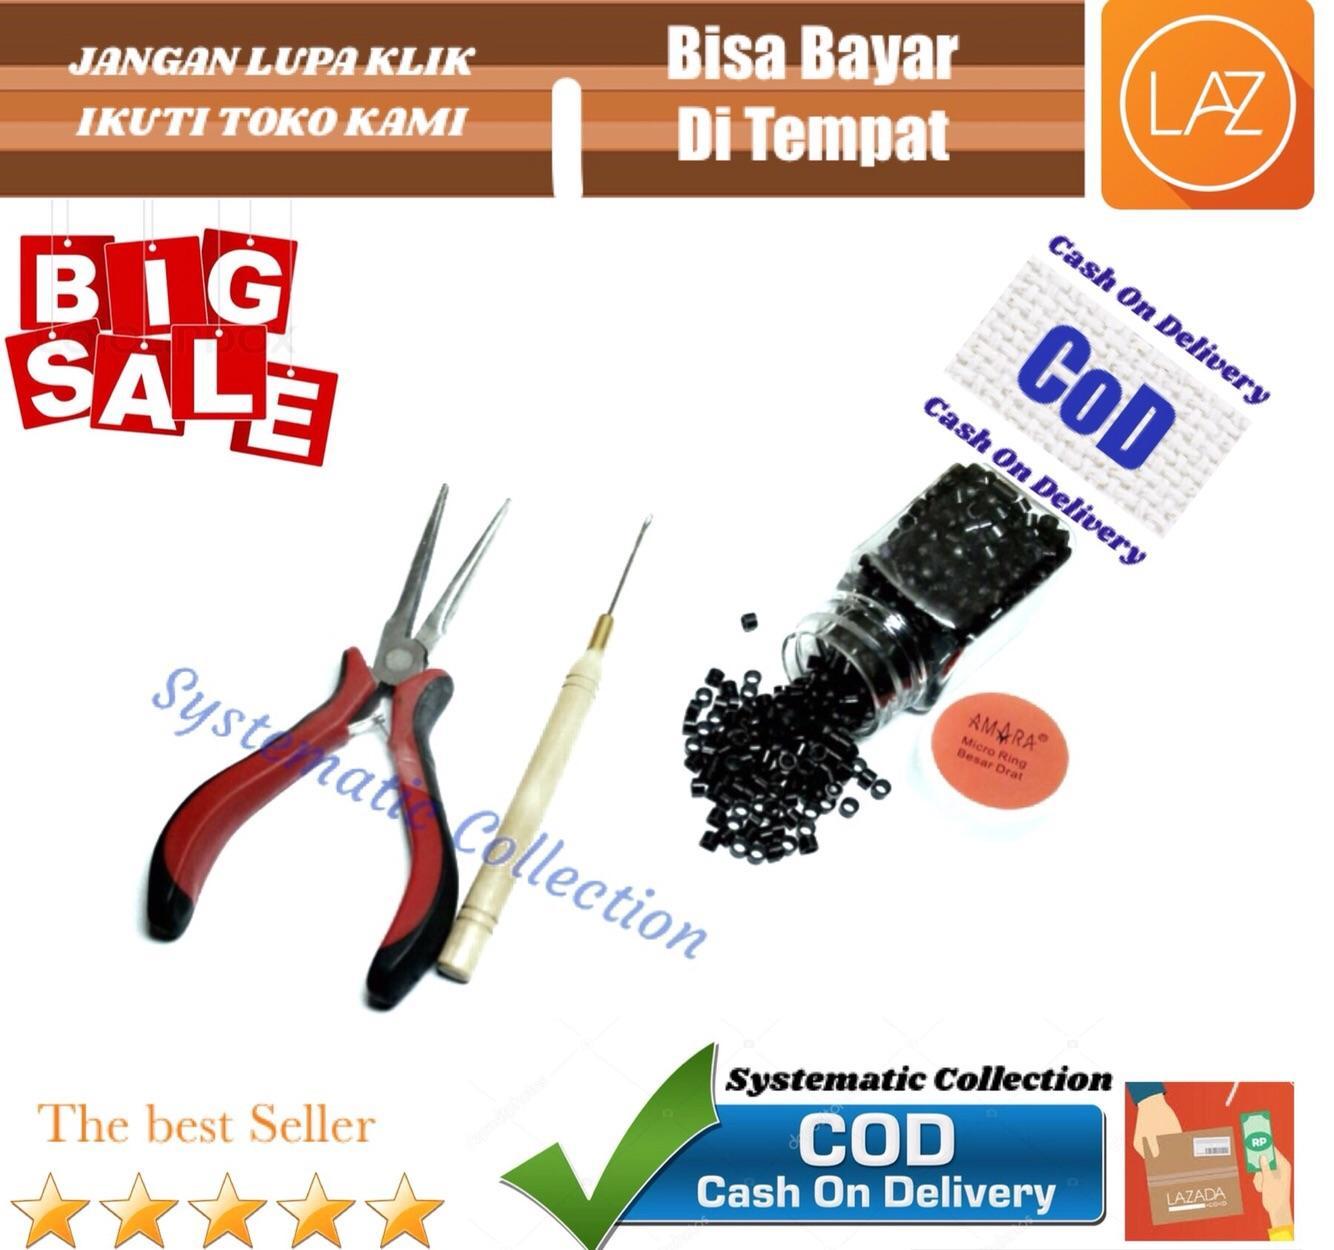 Amara Ring rambut sambung 1 paket ( Tang dan penjepit ) COD/Bisa bayar di tempat / Systematic Collection